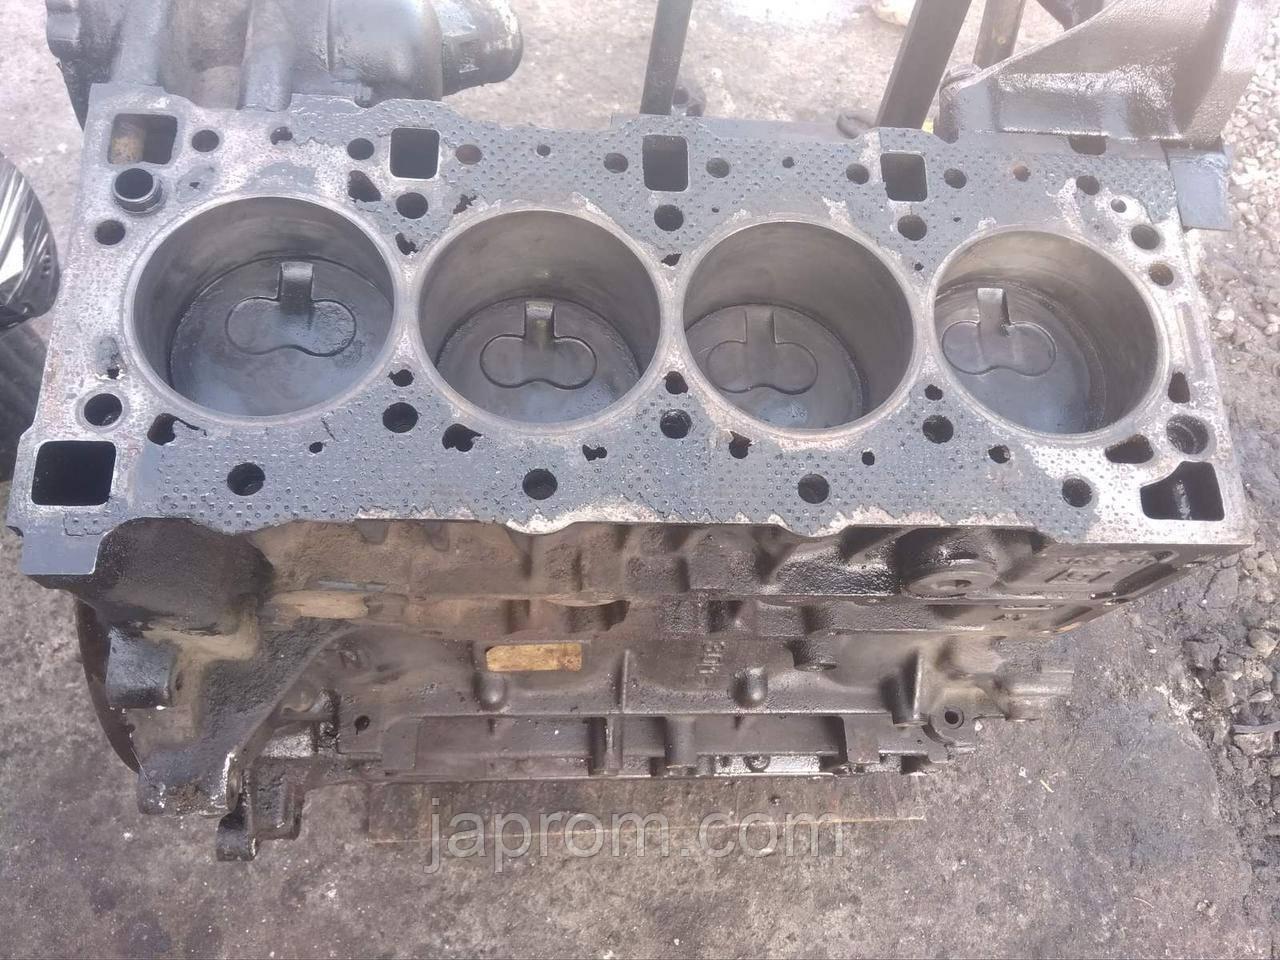 Блок цилиндров (двигателя) Peugeot Boxer Citroen Jumper 2.5 D 12 Кл. DJ5 (T9A)